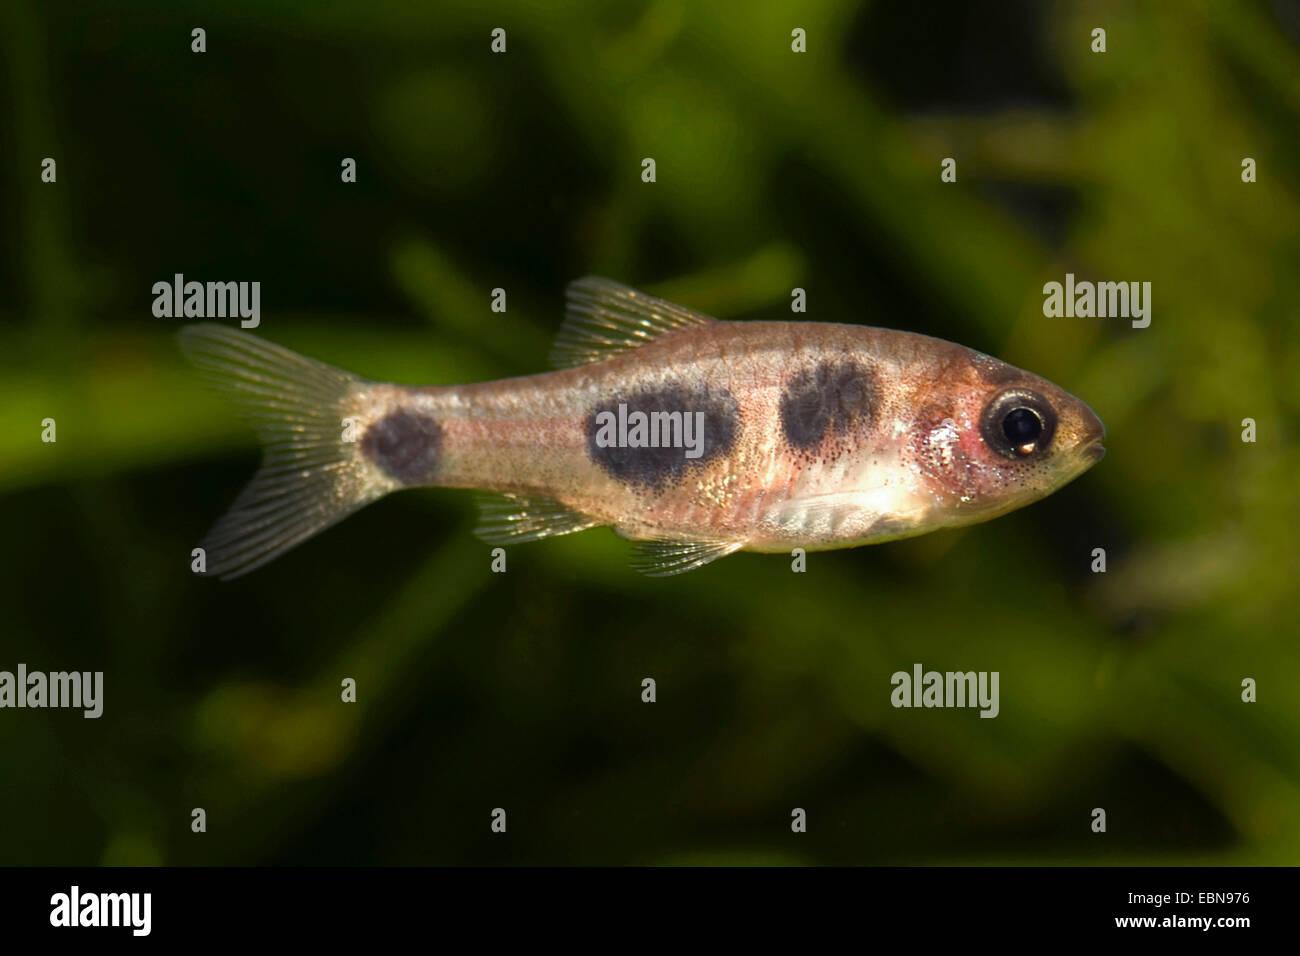 Butterfly barb (Barbus hulstaerti), swimming - Stock Image